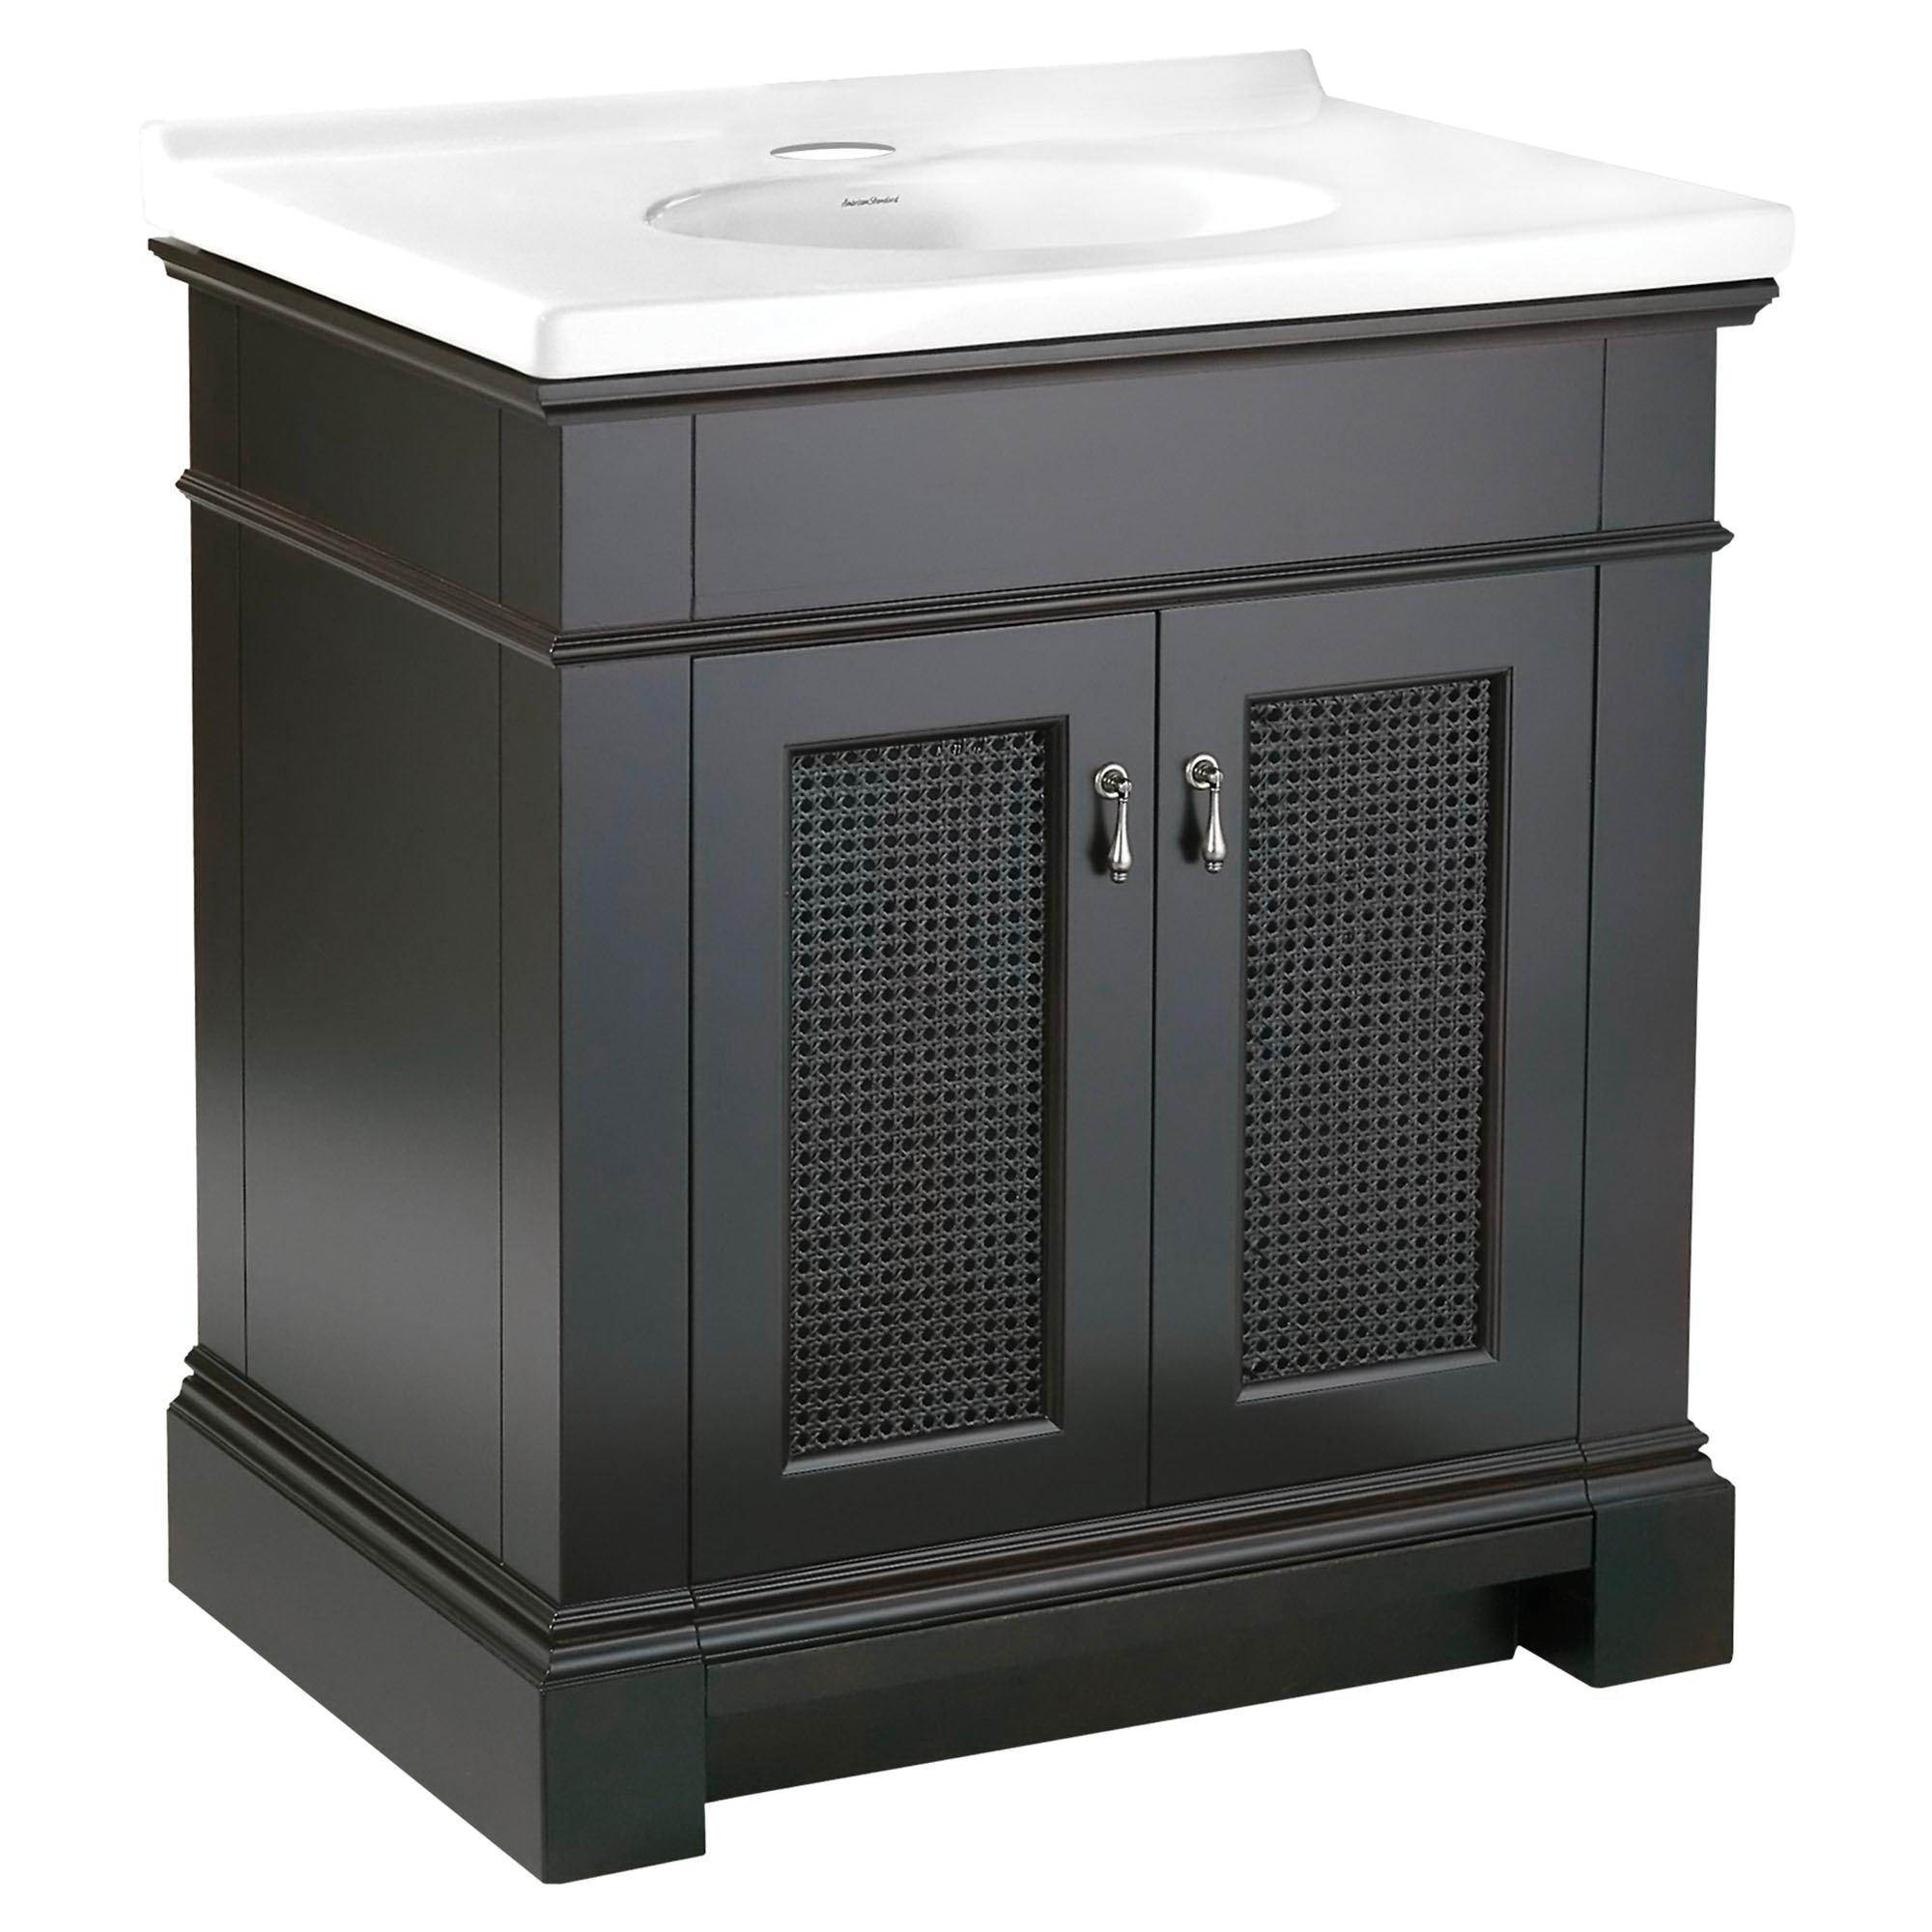 American Standard 9210030.322 Portsmouth® Transitional Vanity, 33-1/4 in OAH x 21-1/2 in OAW x 30 in OAD, Wall Mount, Dark Chocolate Cabinet, Import